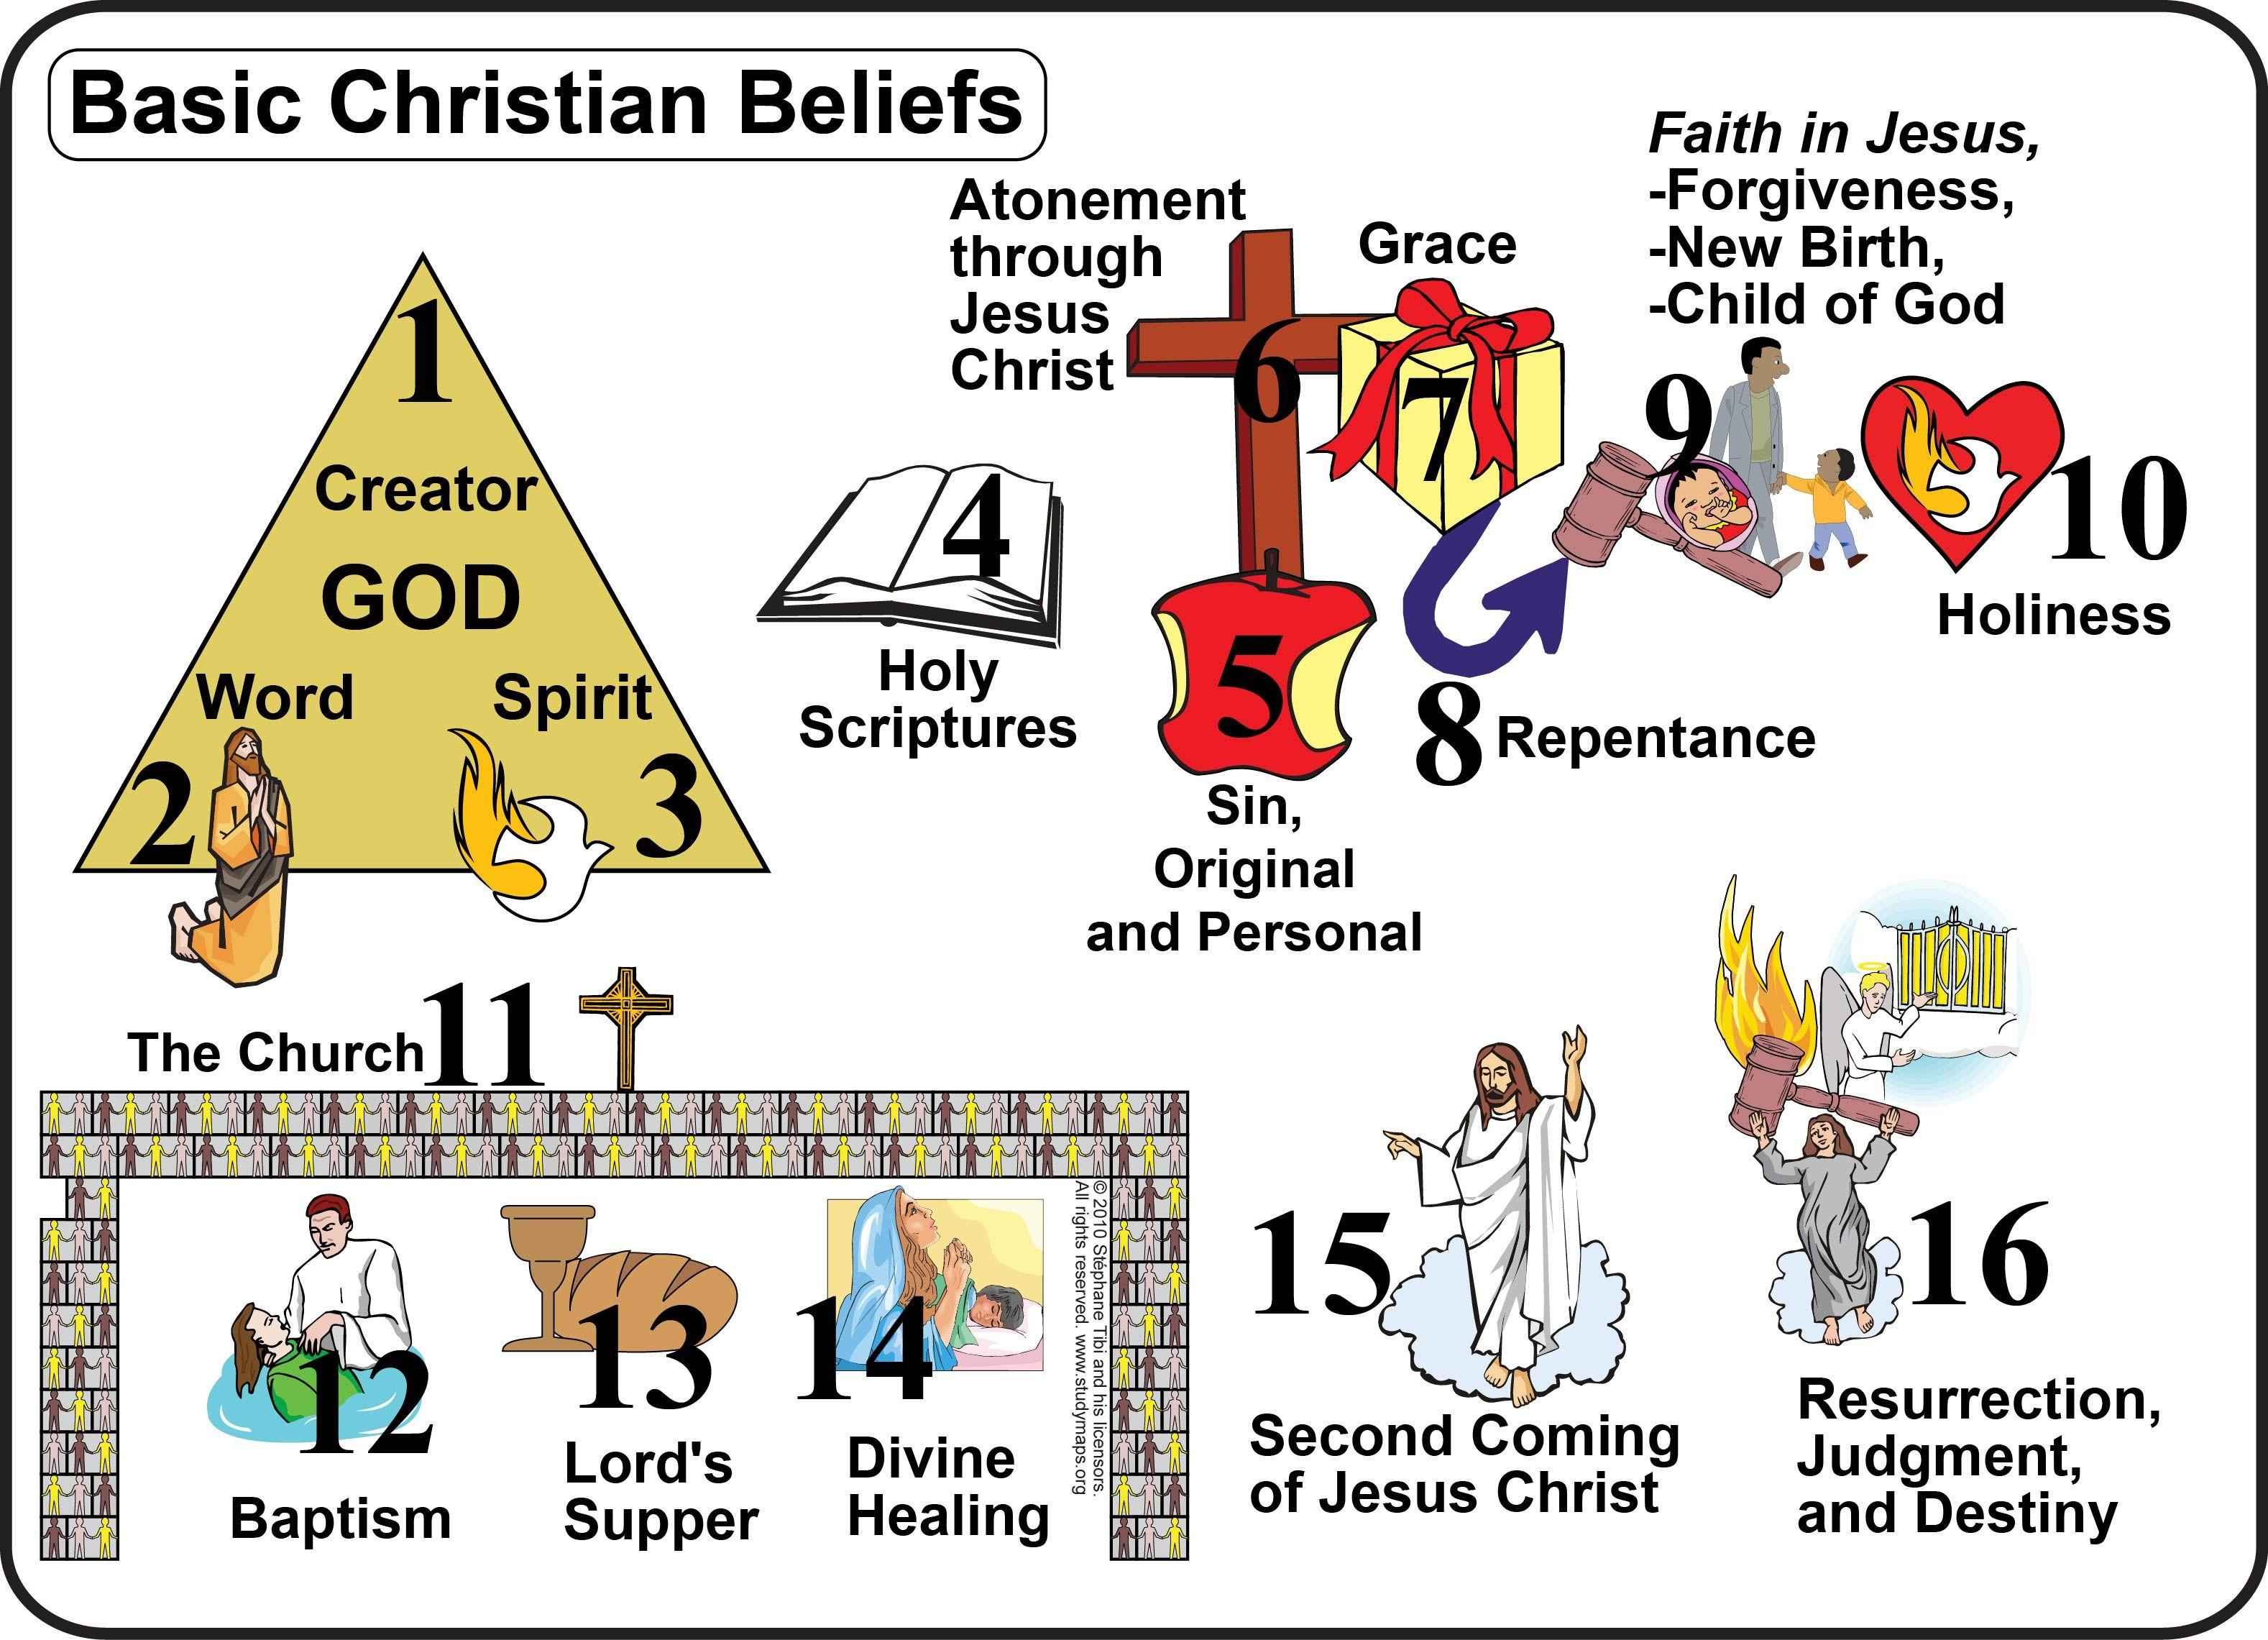 Basically Mormonism